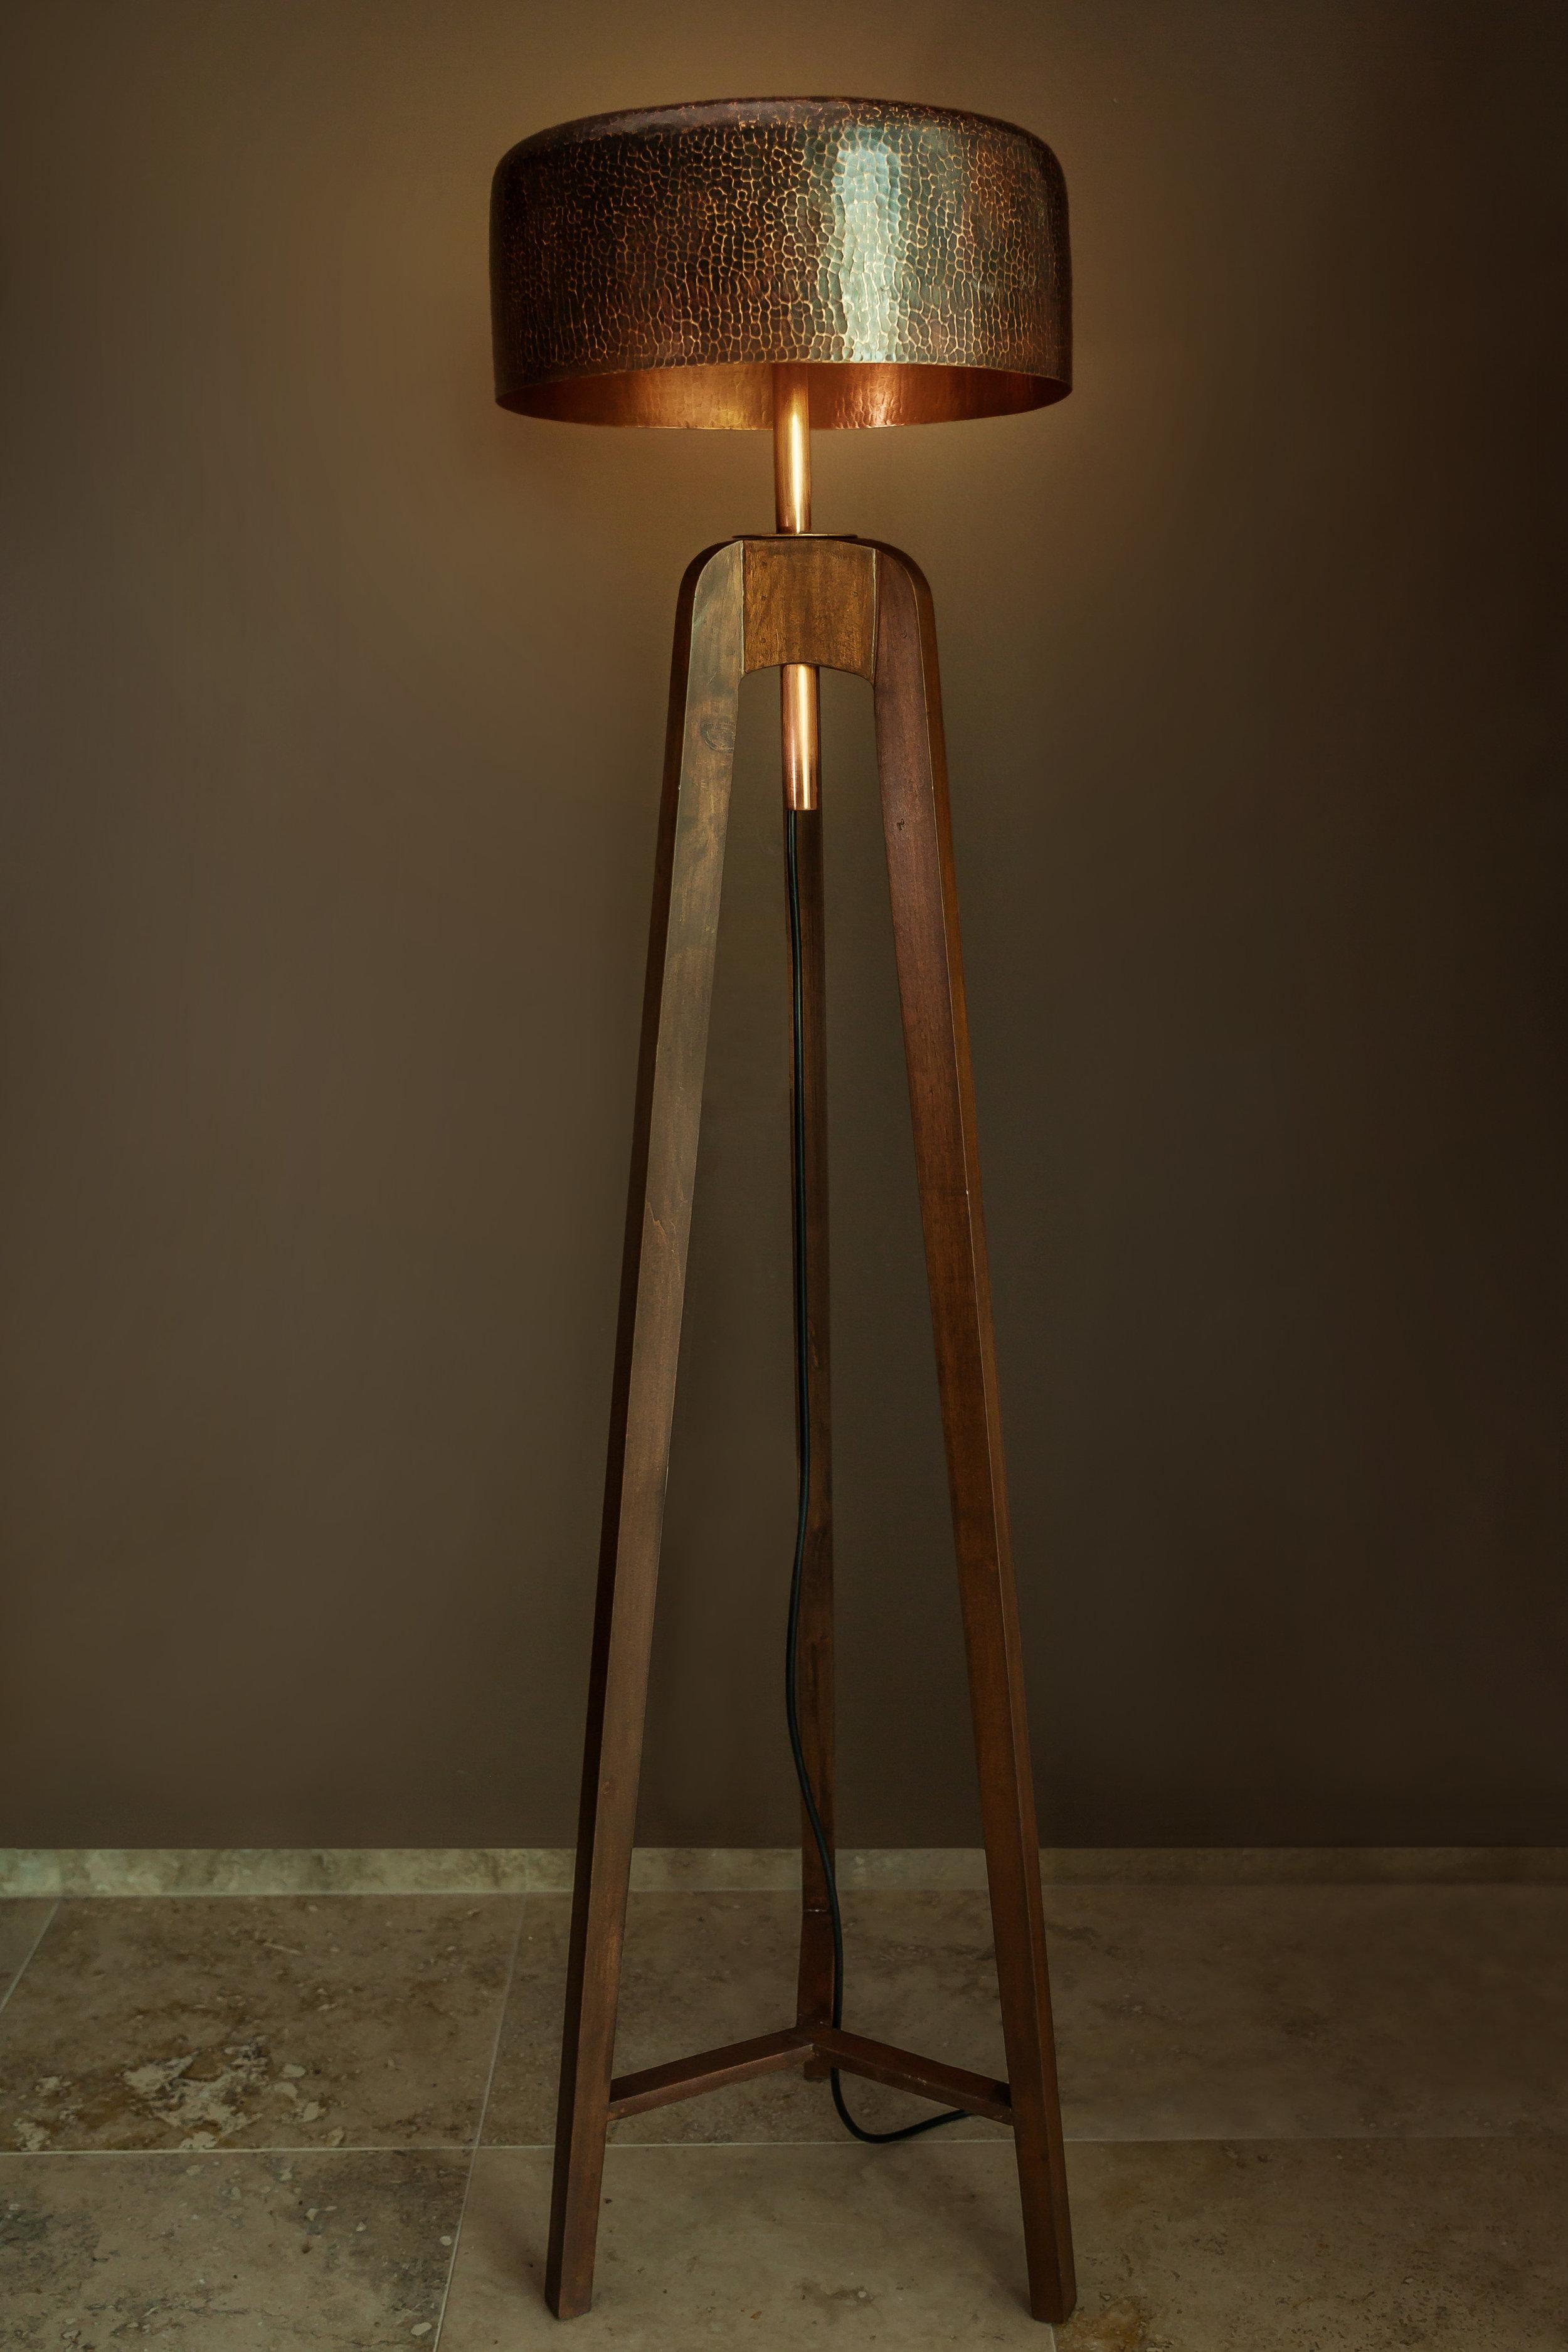 zoe - HI lamps 08.JPG